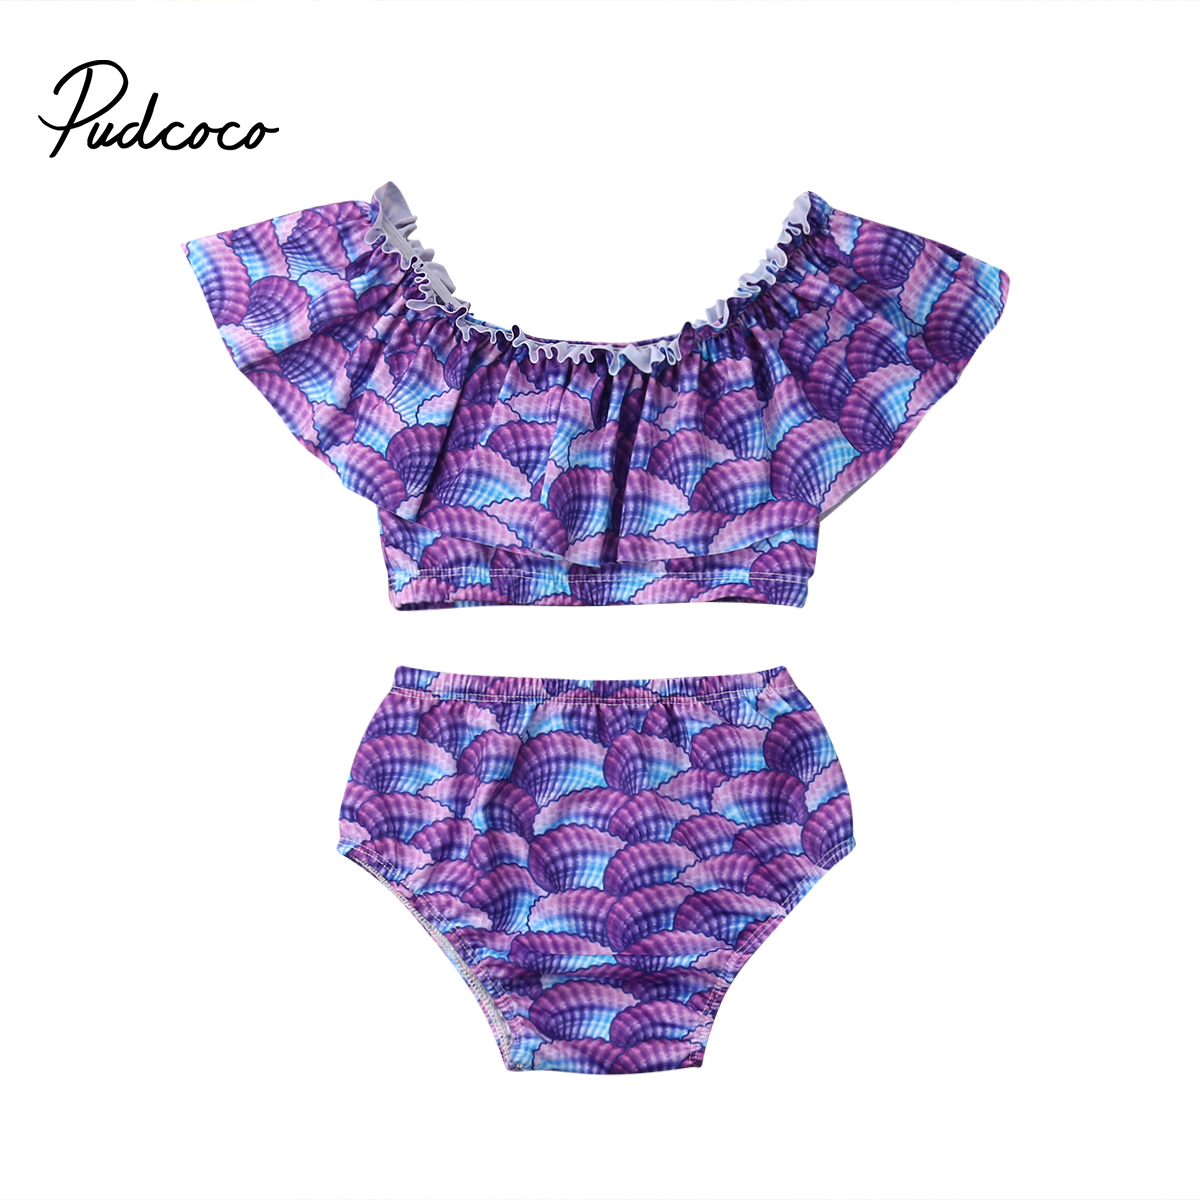 2pcs Toddler Baby Girl Mermaid Scale Cool Dew Belly Doll Collar Swimwear Bathing Suit Bikini Swimsuit Set